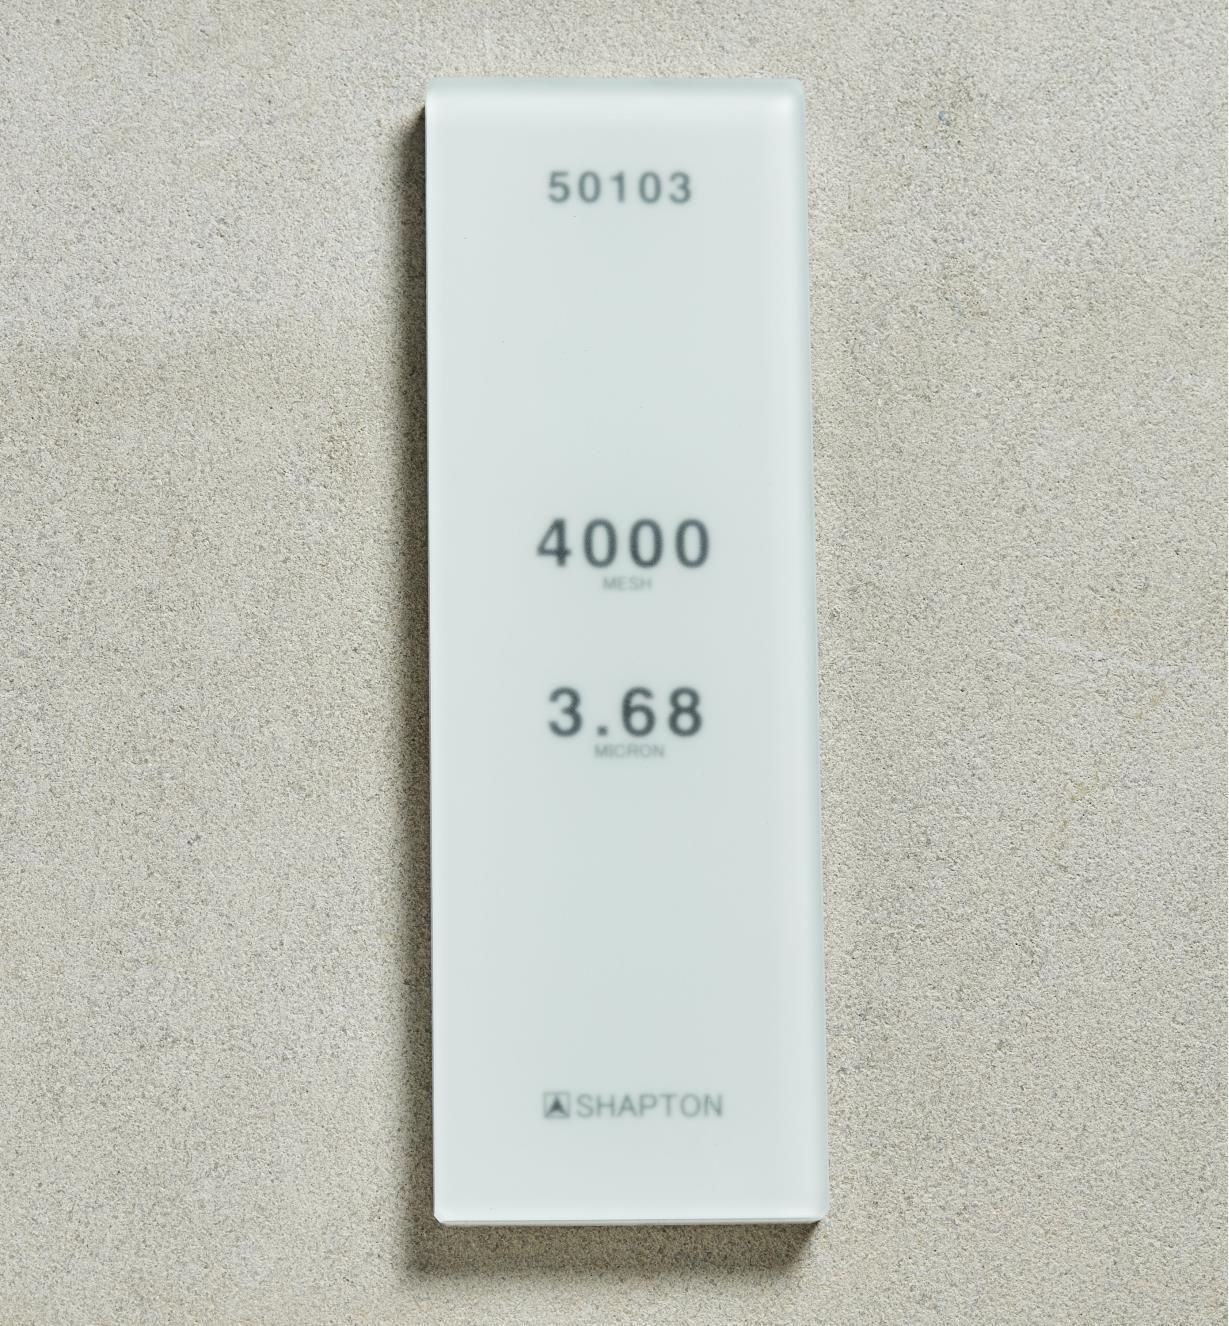 61M0308 - Shapton GlassStone HR Stone 36.8µ 4000x